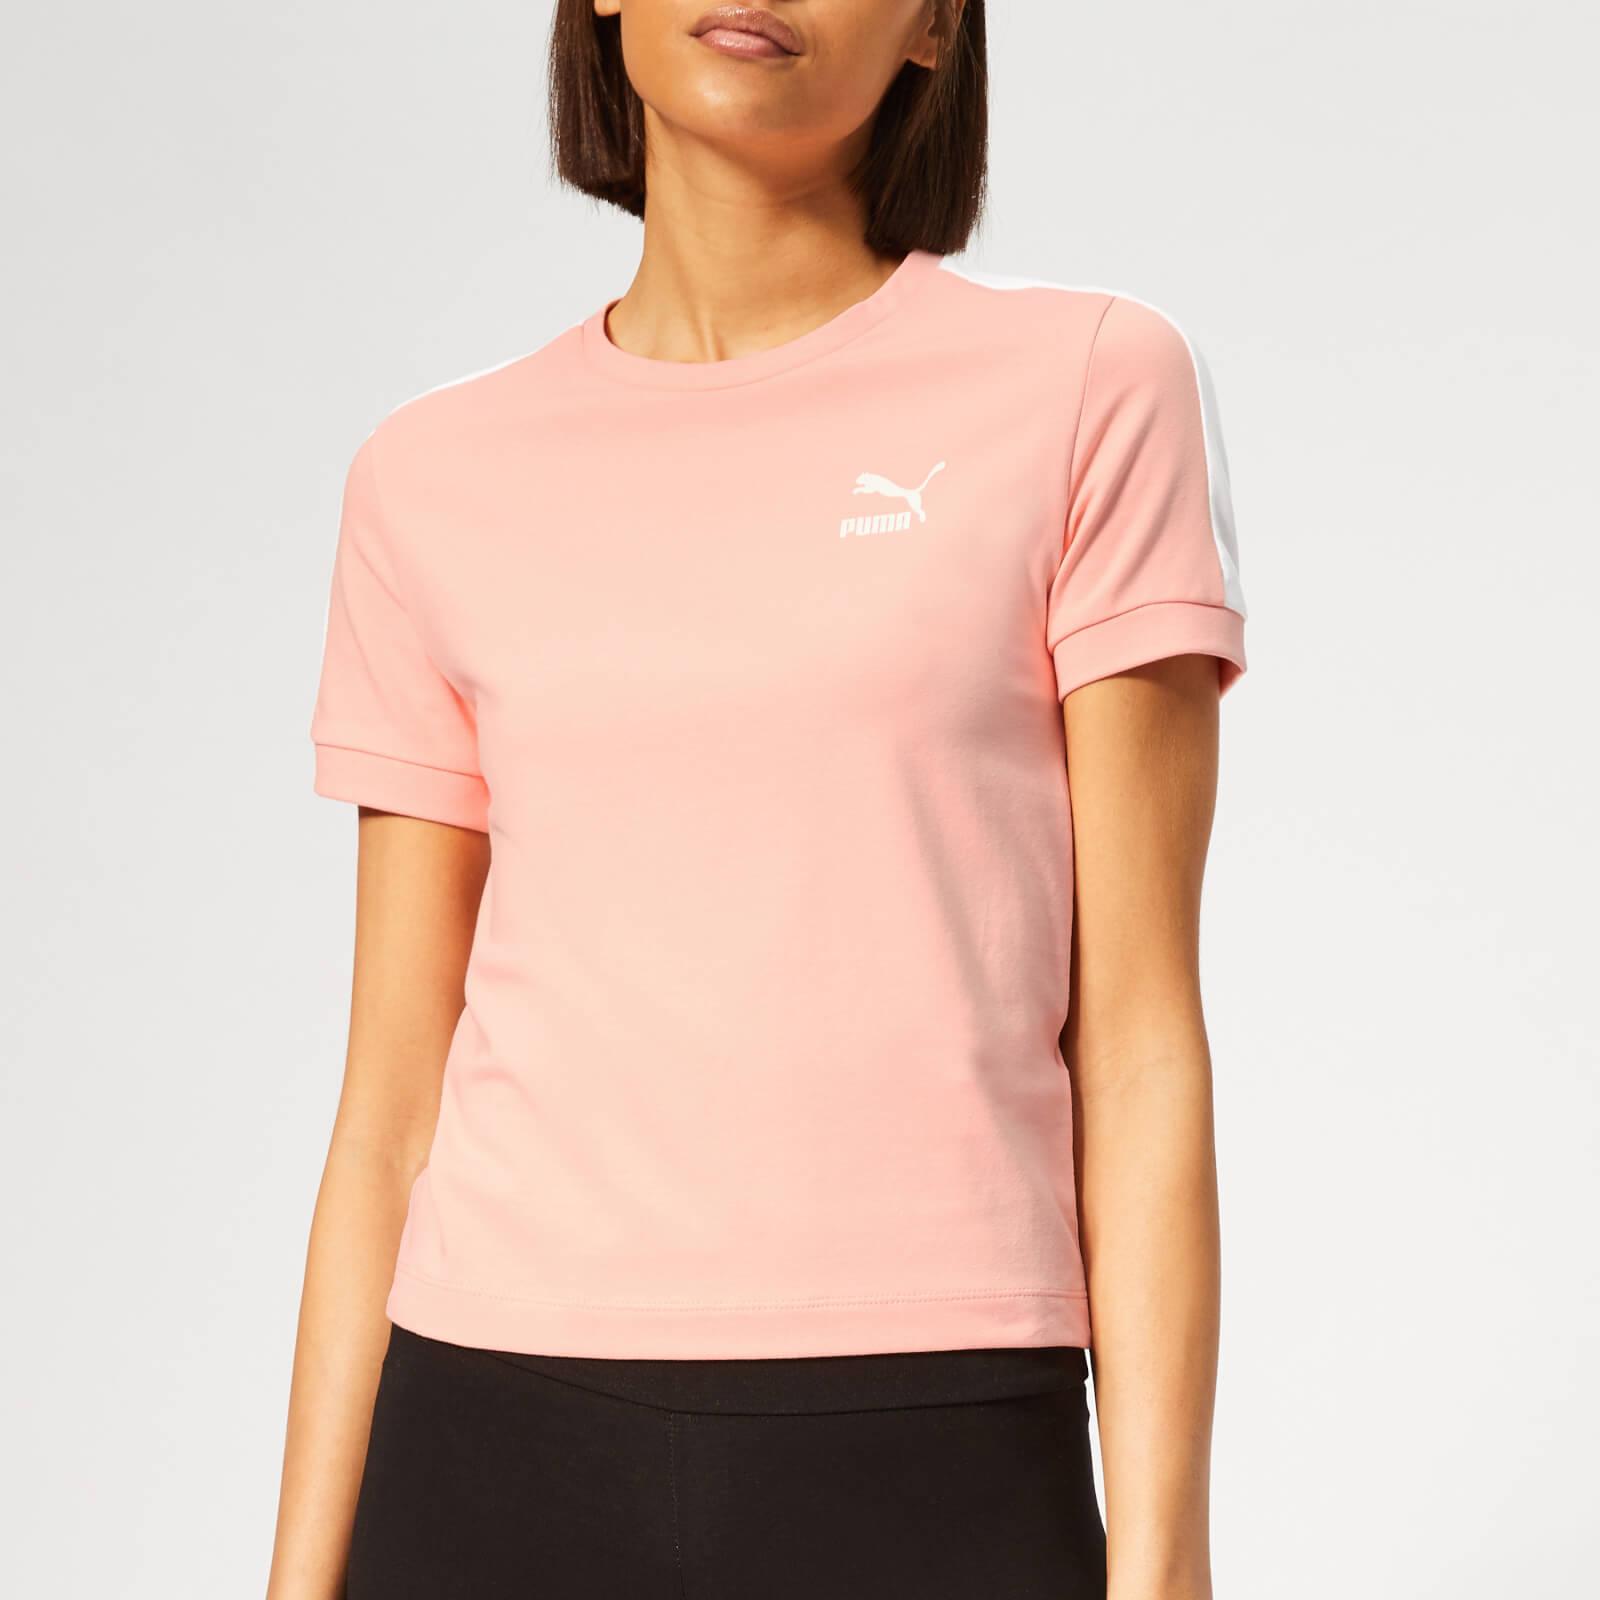 Puma Women's Classics T7 Short Sleeve T-Shirt - Peach Bud - S - Pink